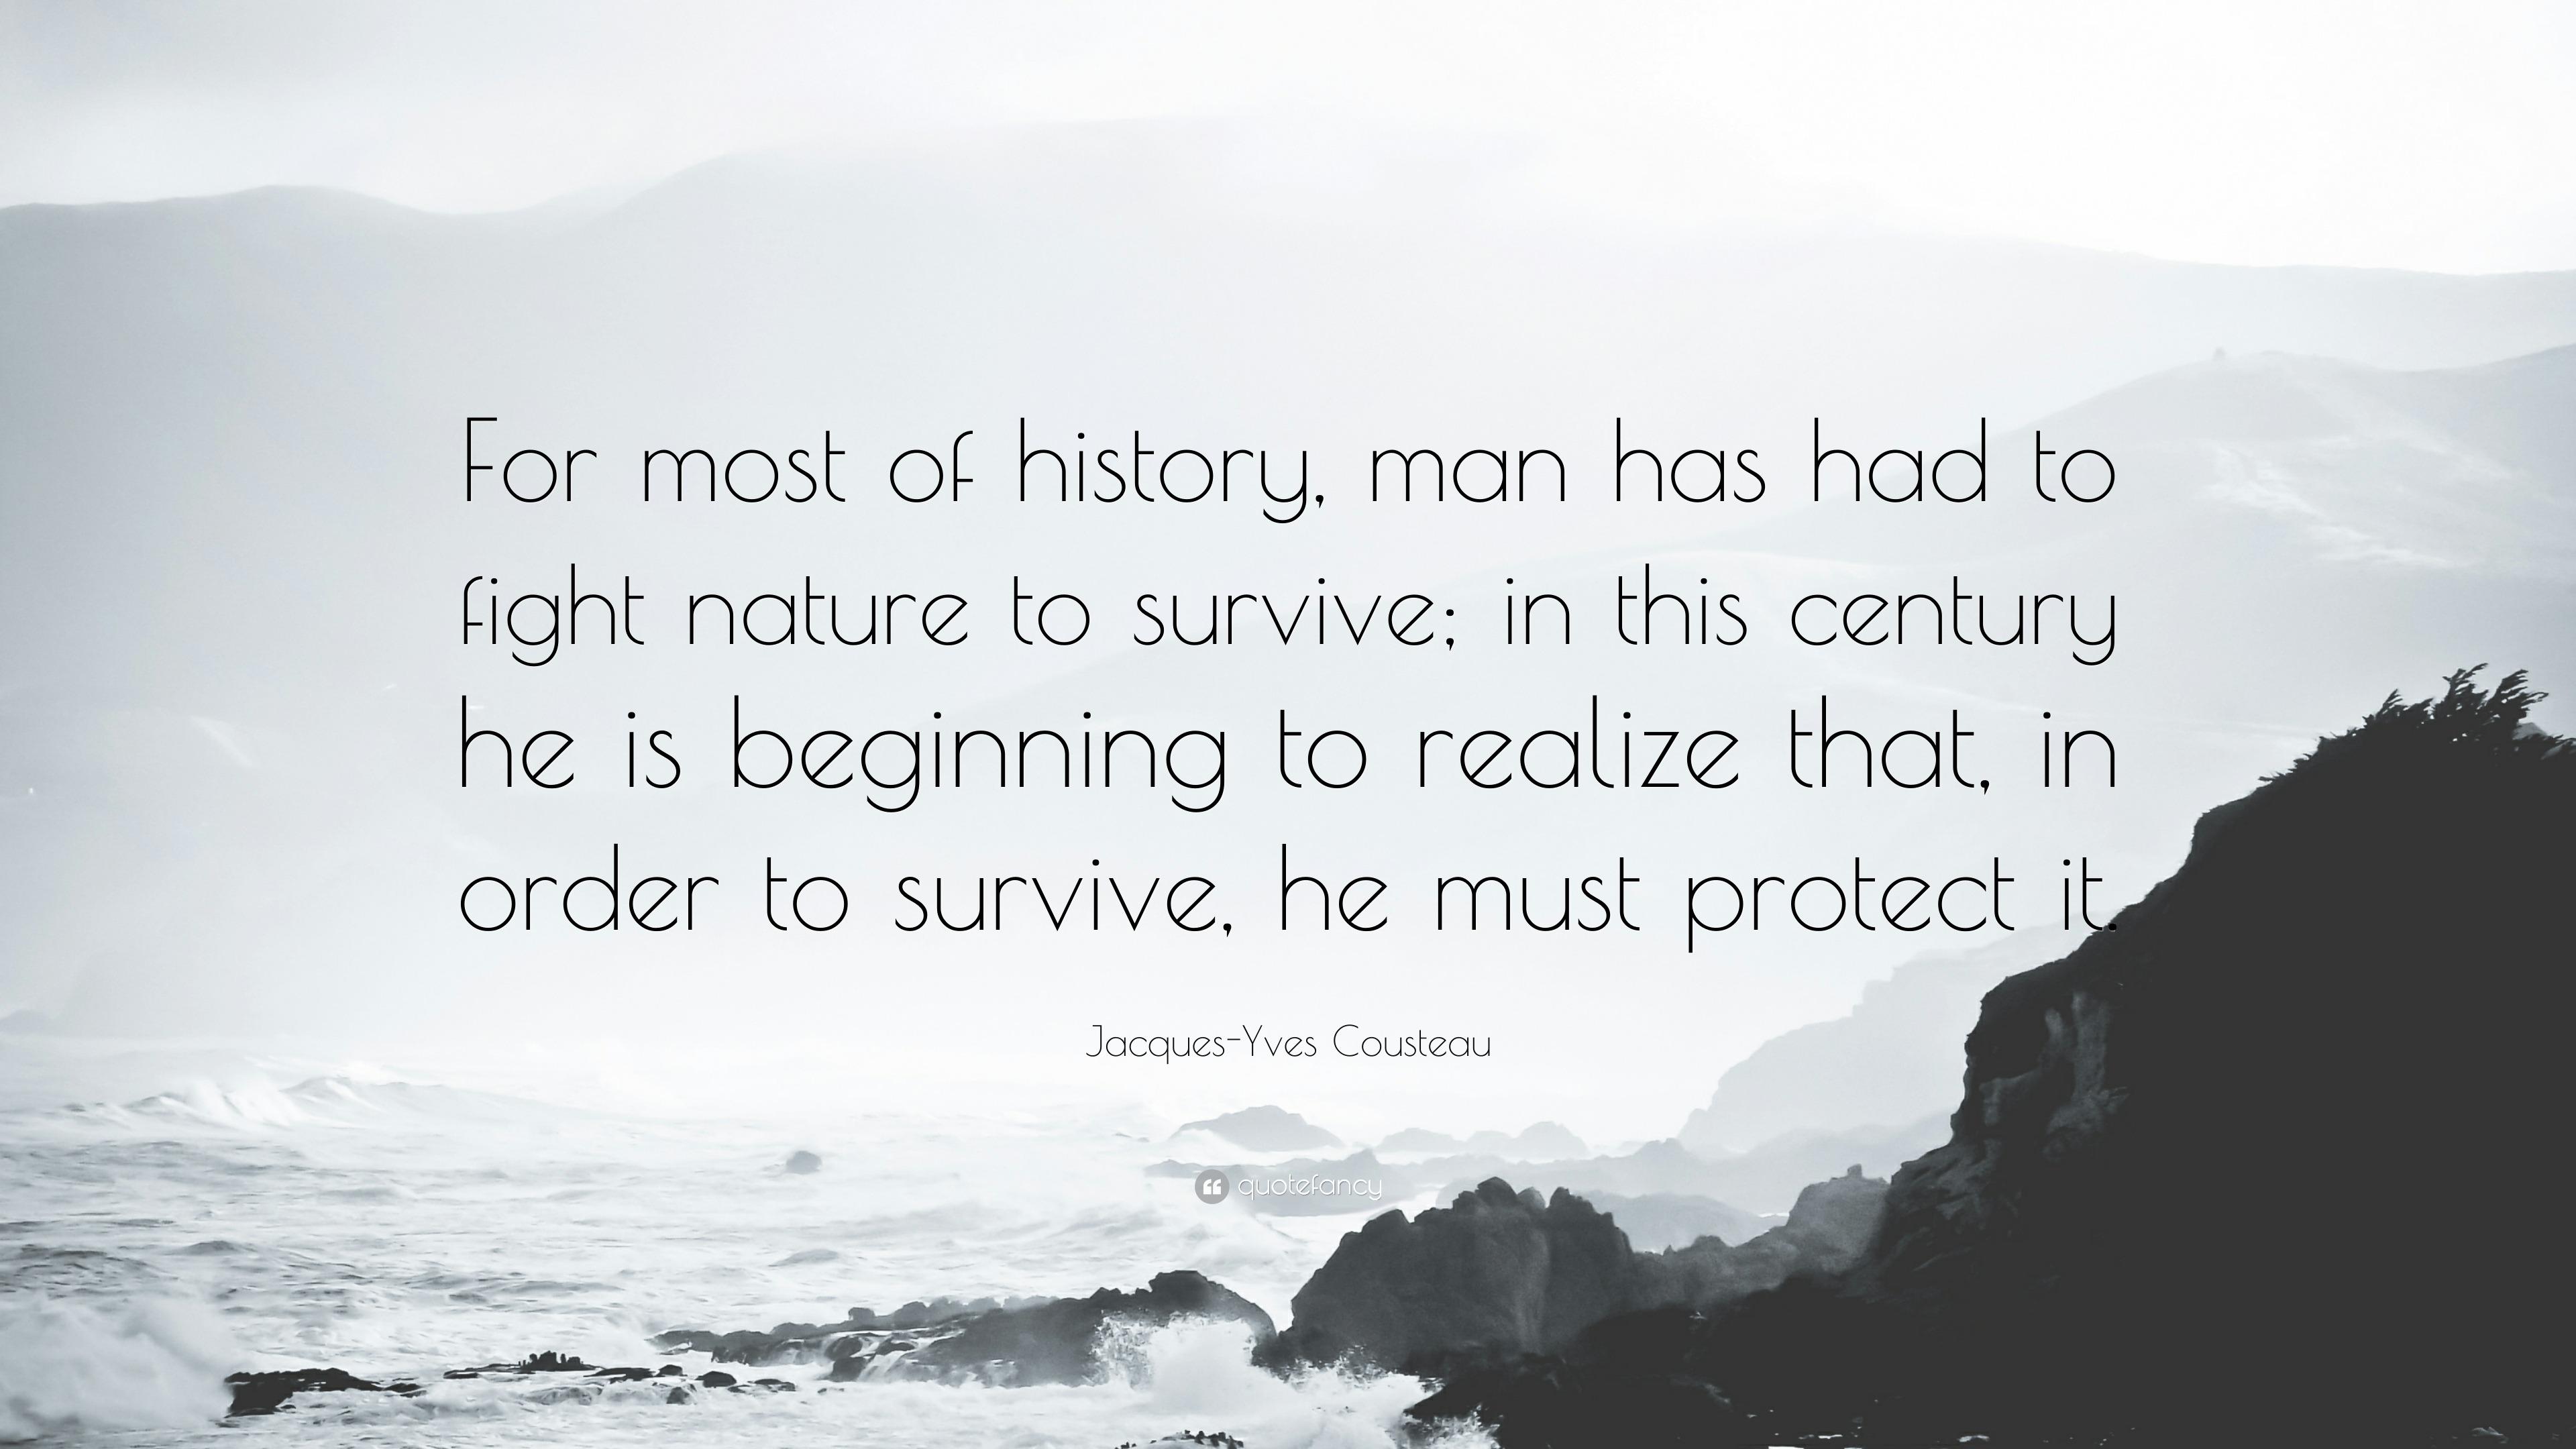 Jacques Cousteau Quotes   Jacques Yves Cousteau Quotes 62 Wallpapers Quotefancy